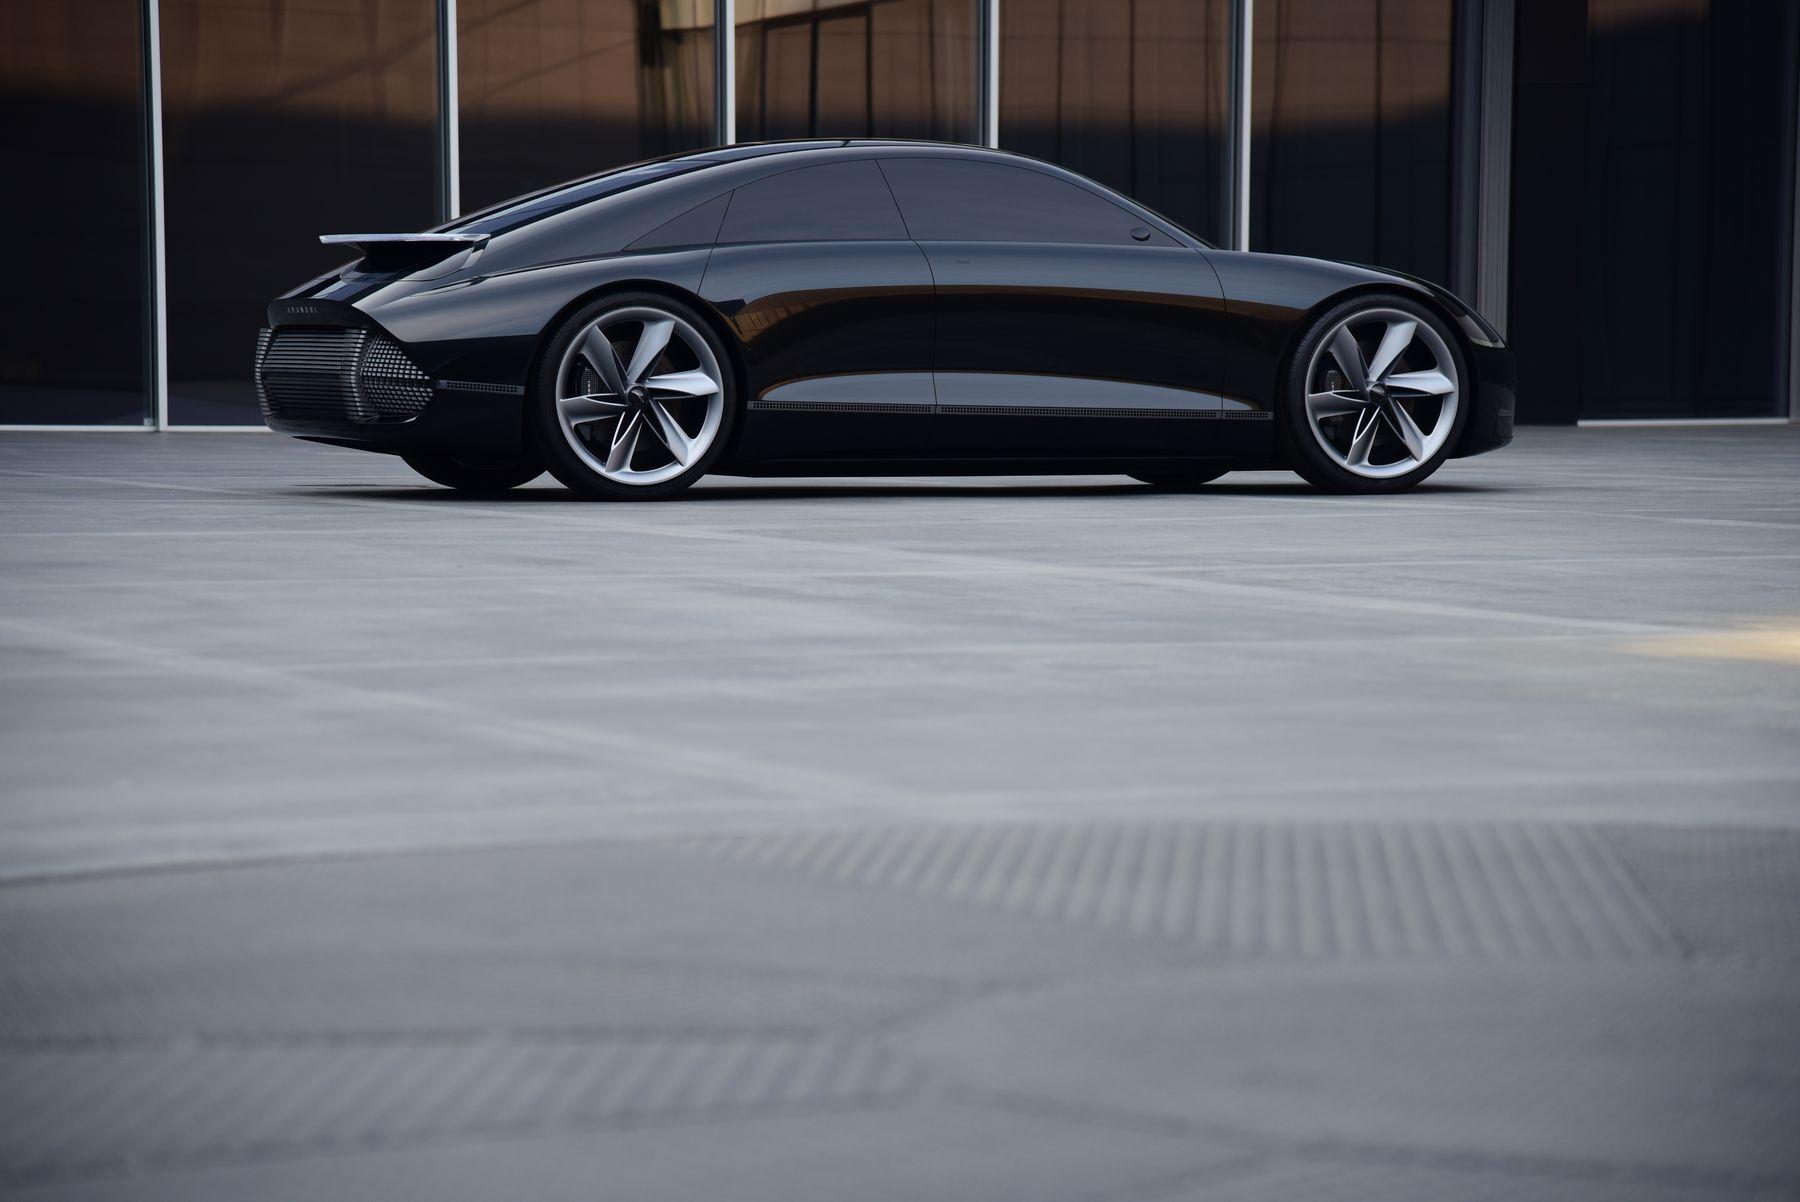 hyundai prophecy concept electric car 1 5